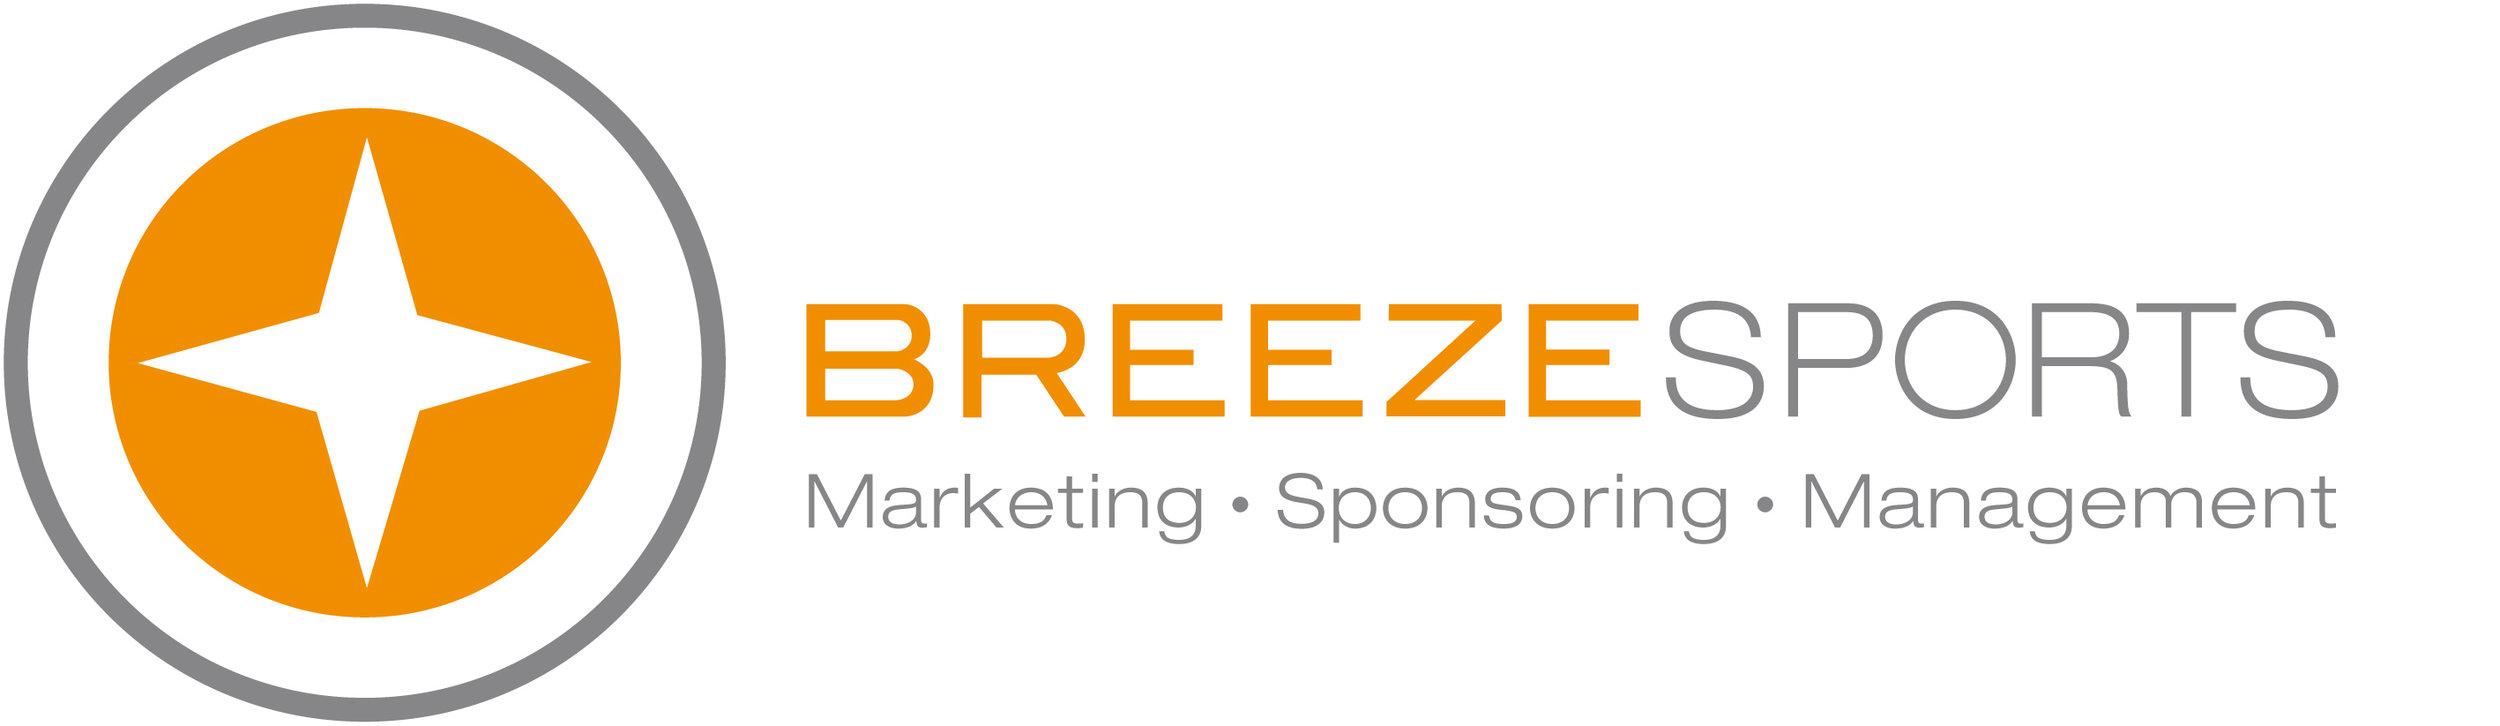 BREEZE Sports Logo in 300dpi mit Unterzeile.jpg